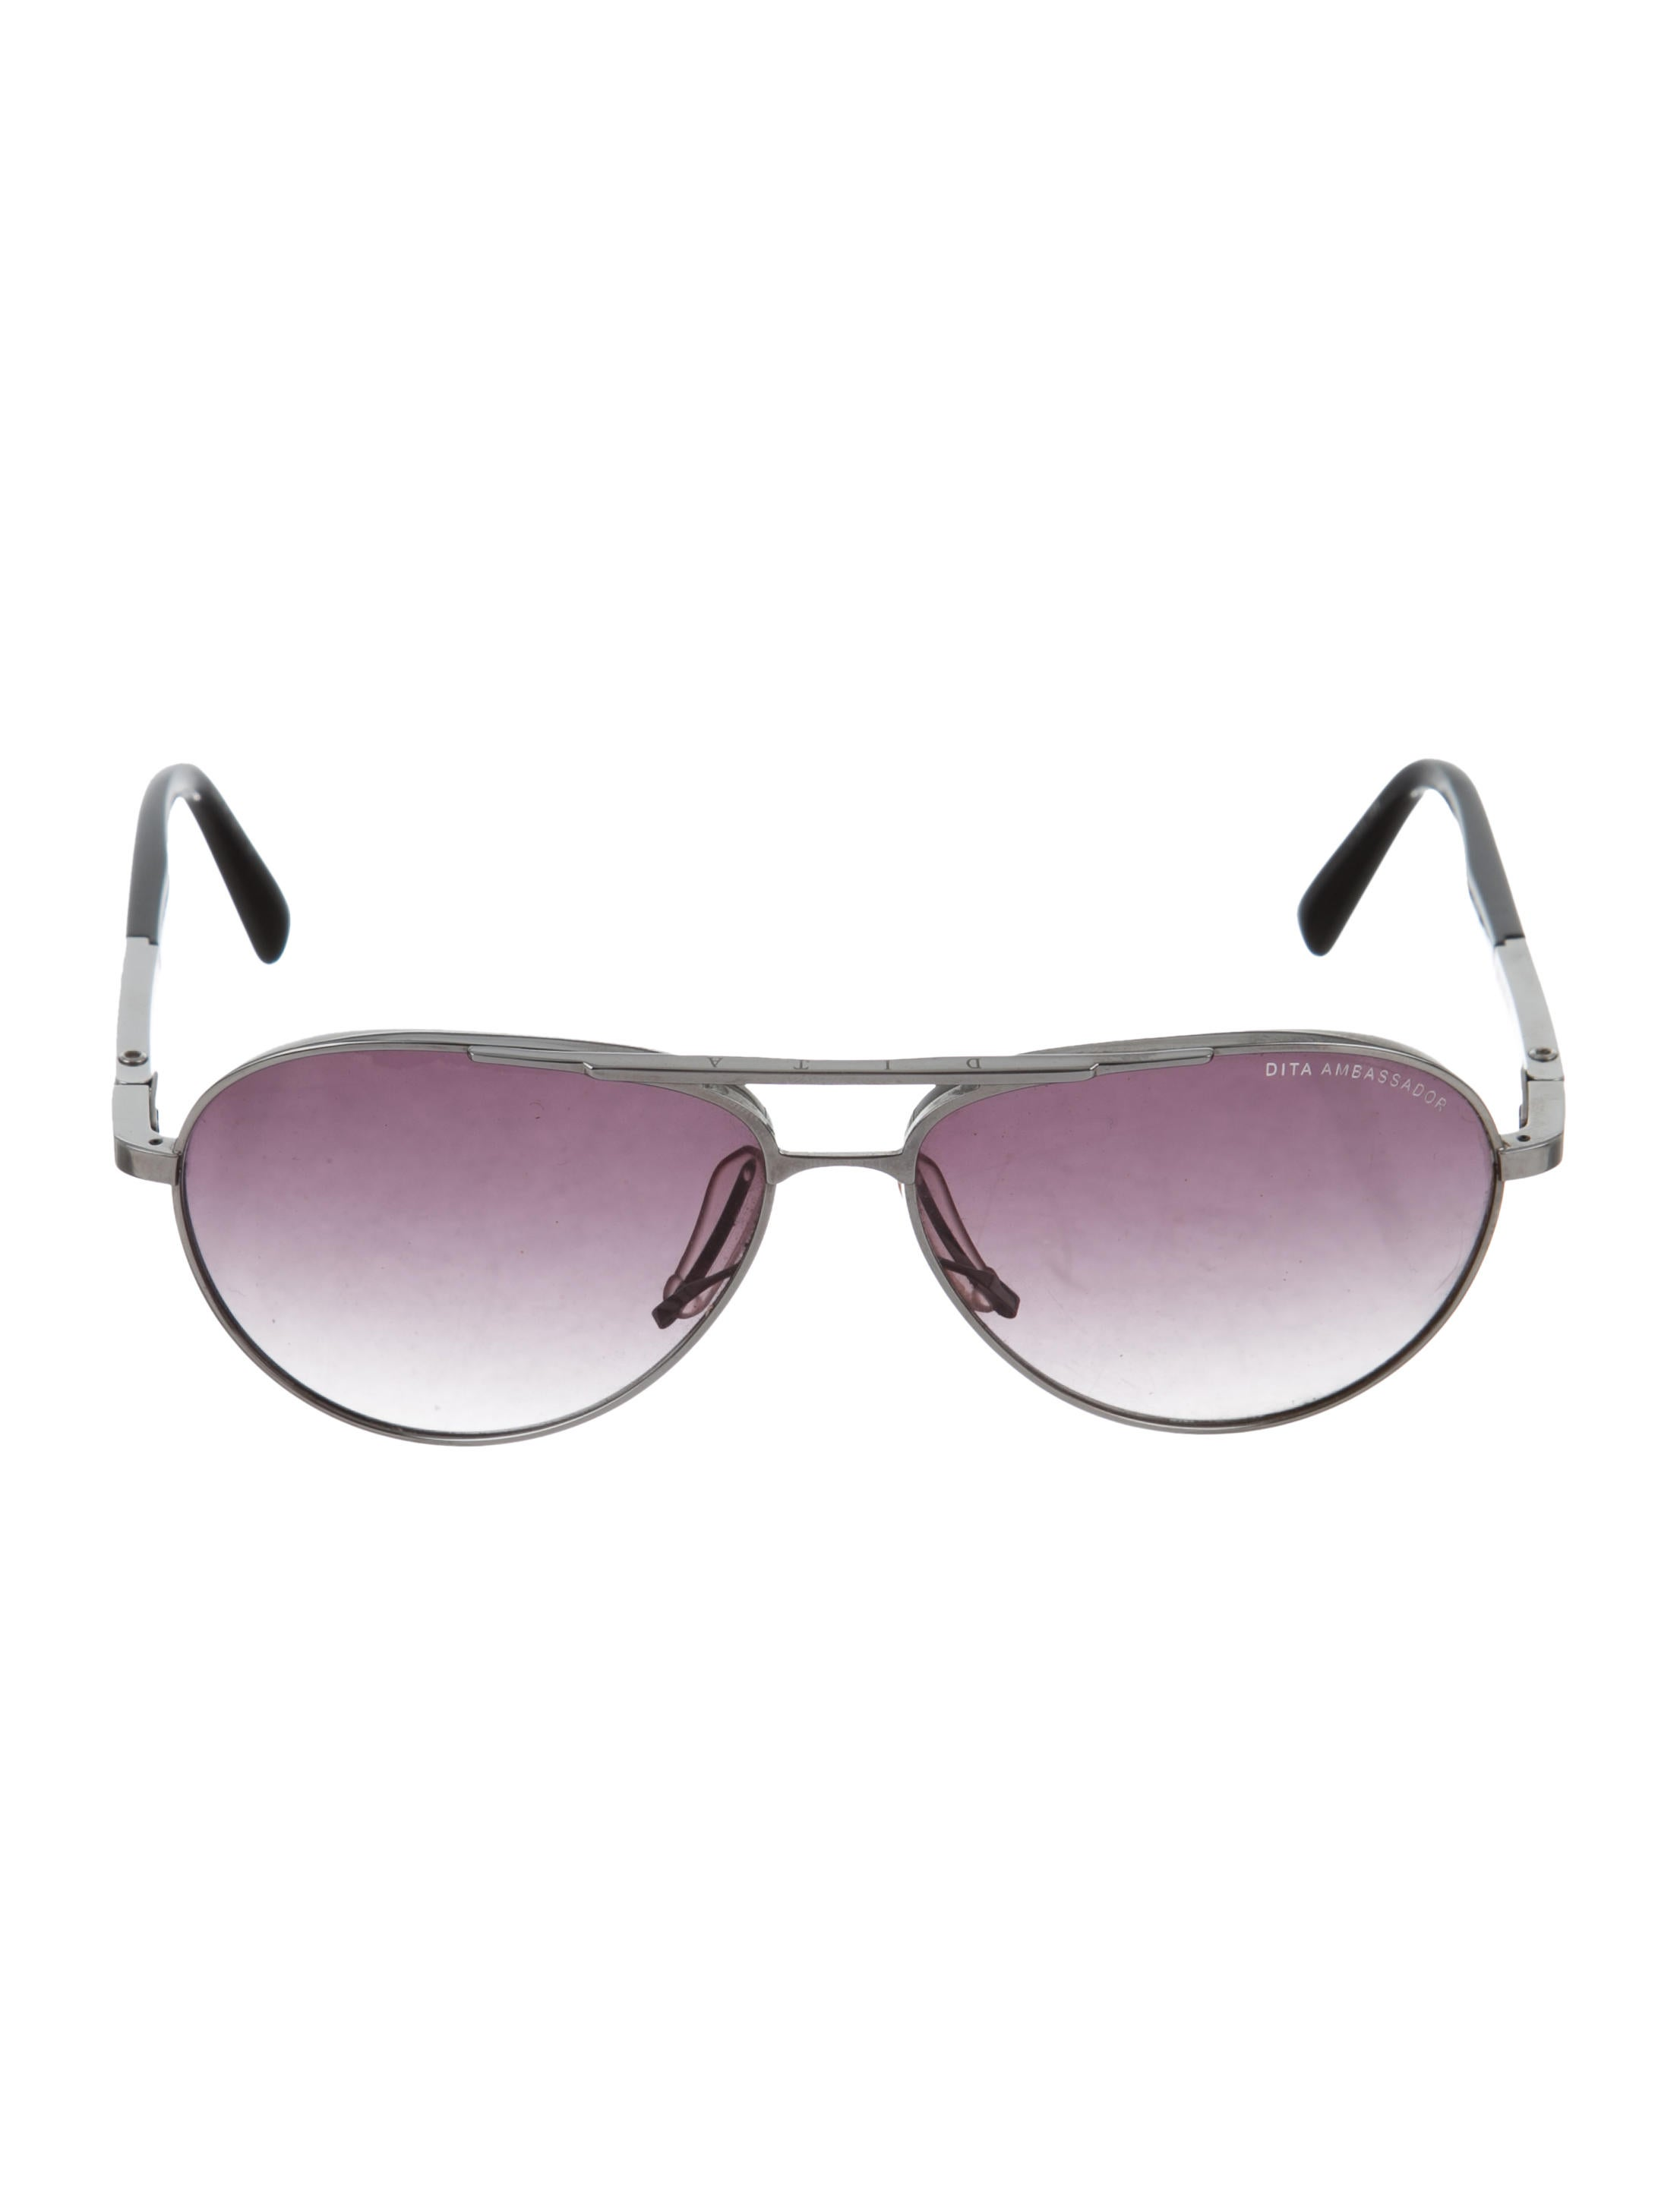 65555980dcf Dita Ambassador Aviator Sunglasses - Accessories - WDT21137